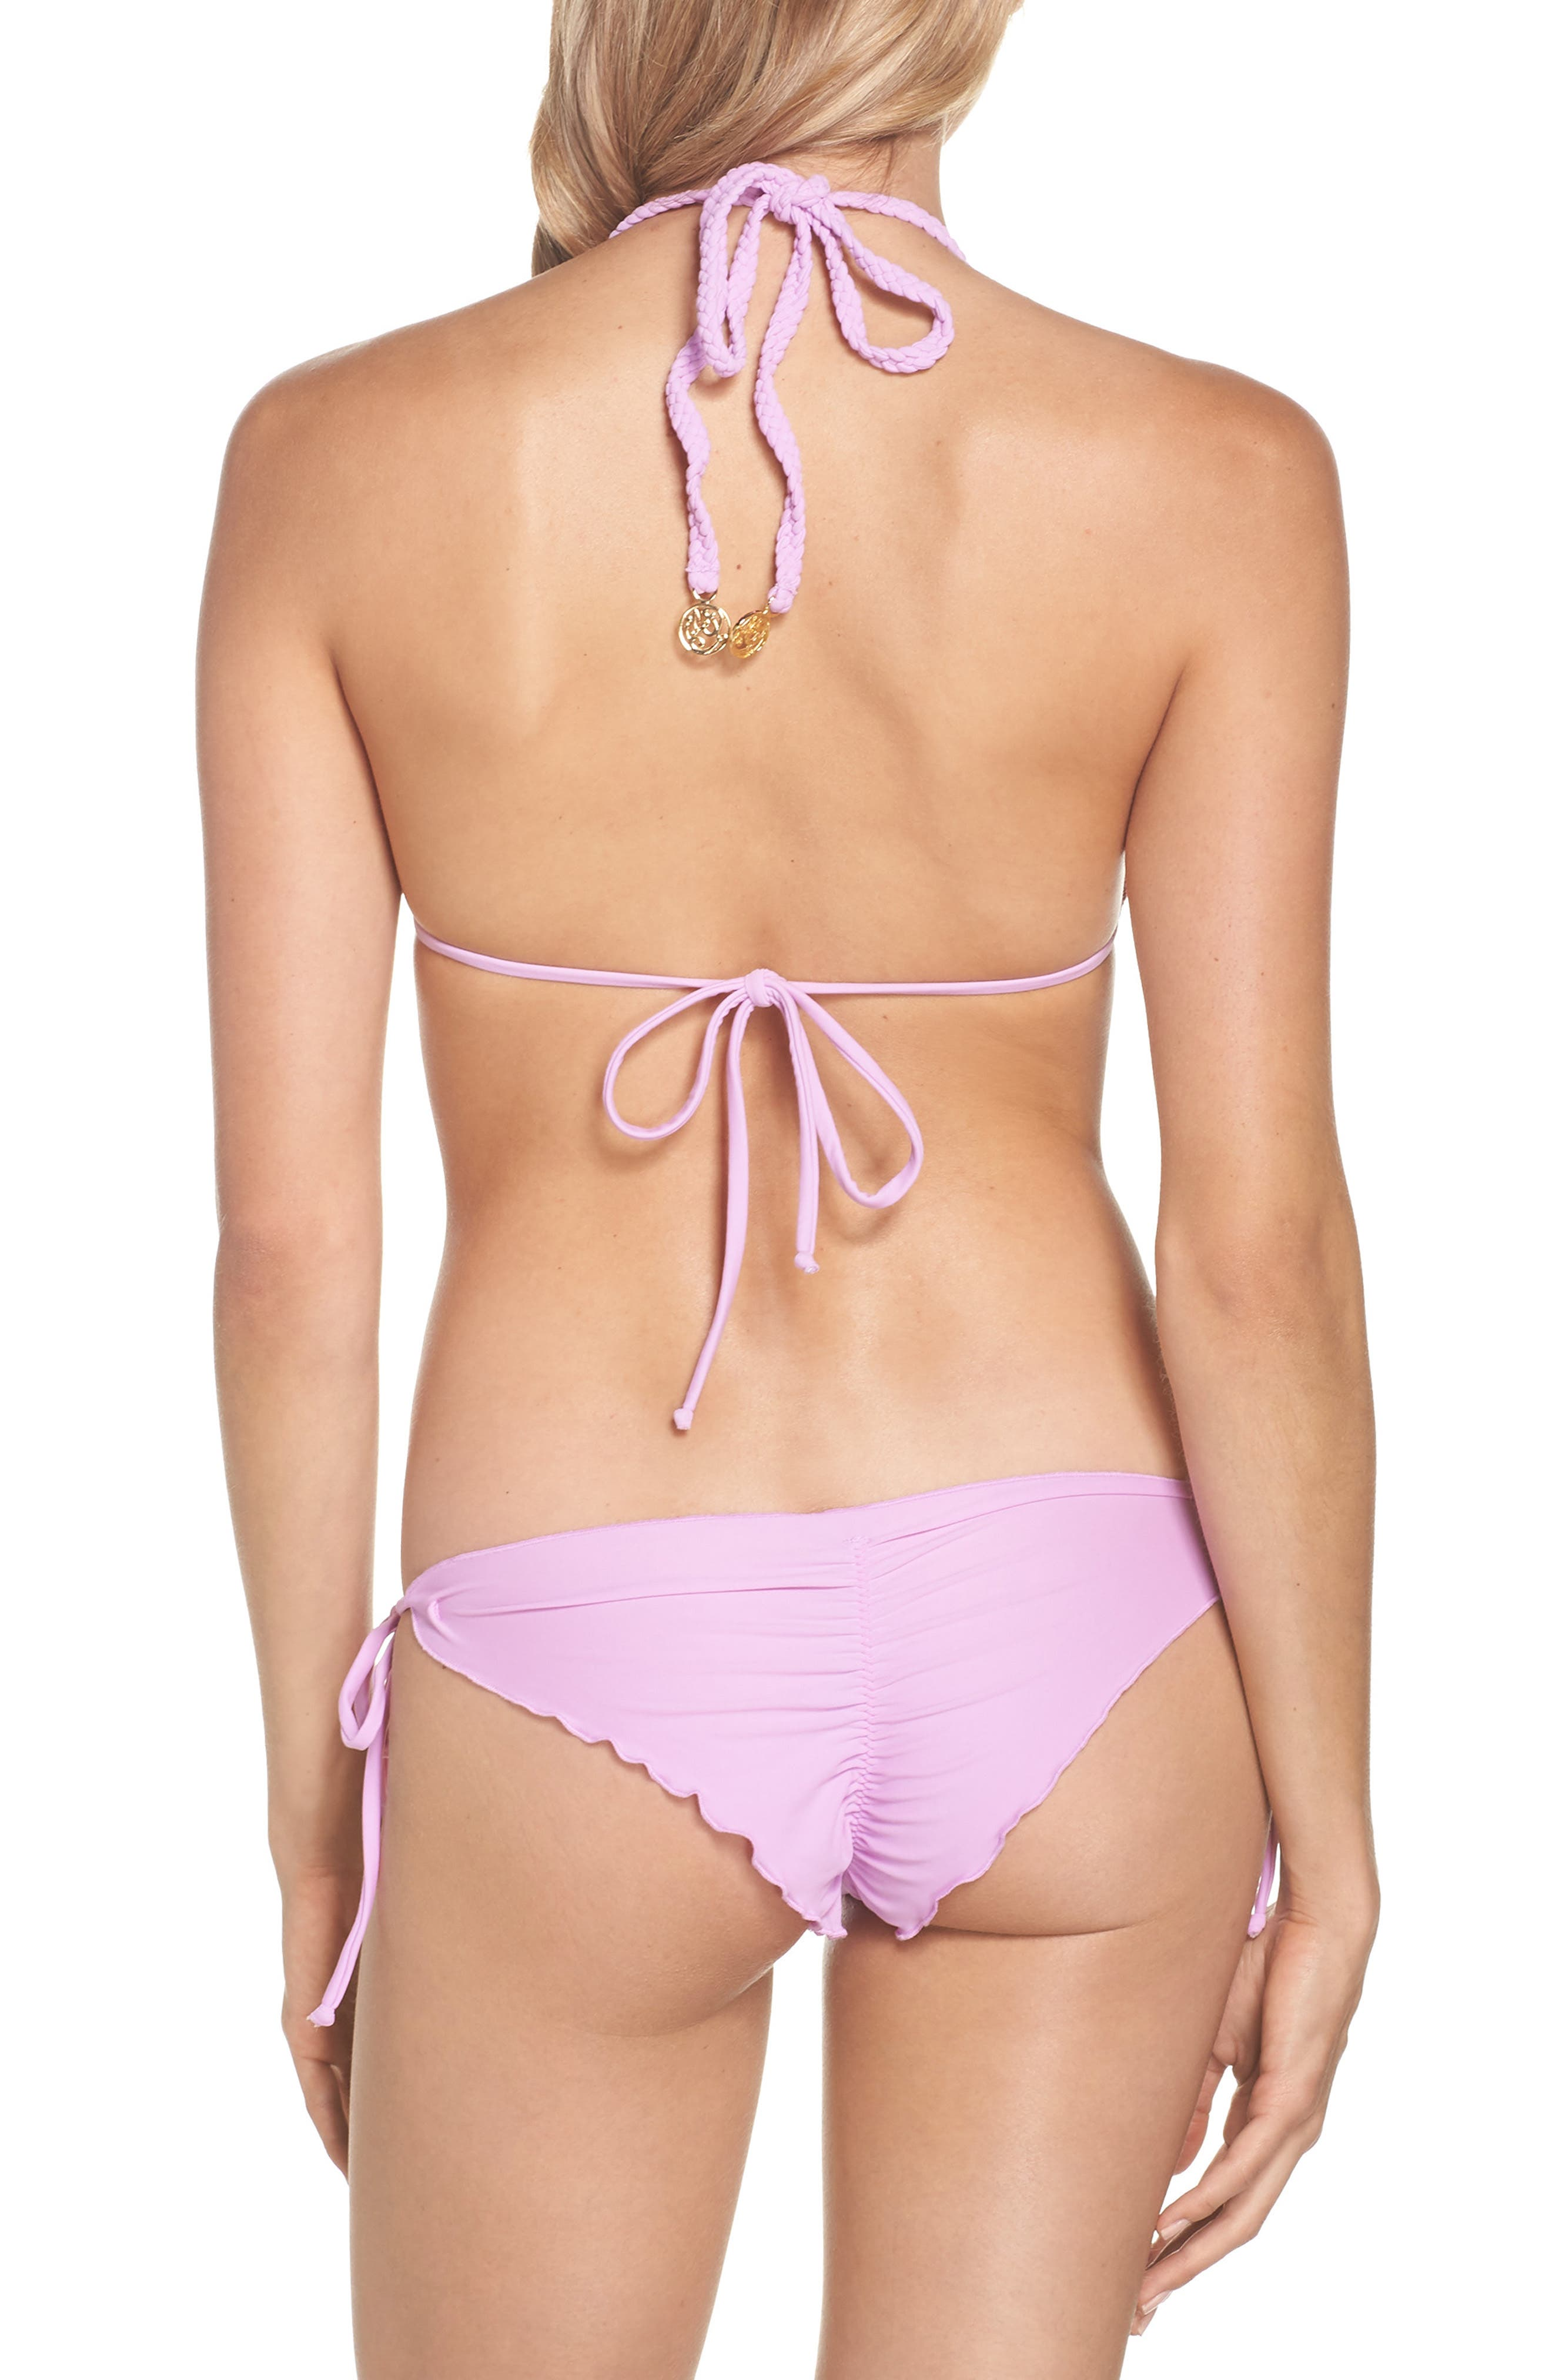 'Wavy' Brazilian Side Tie Bikini Bottoms,                             Alternate thumbnail 6, color,                             Lavanda